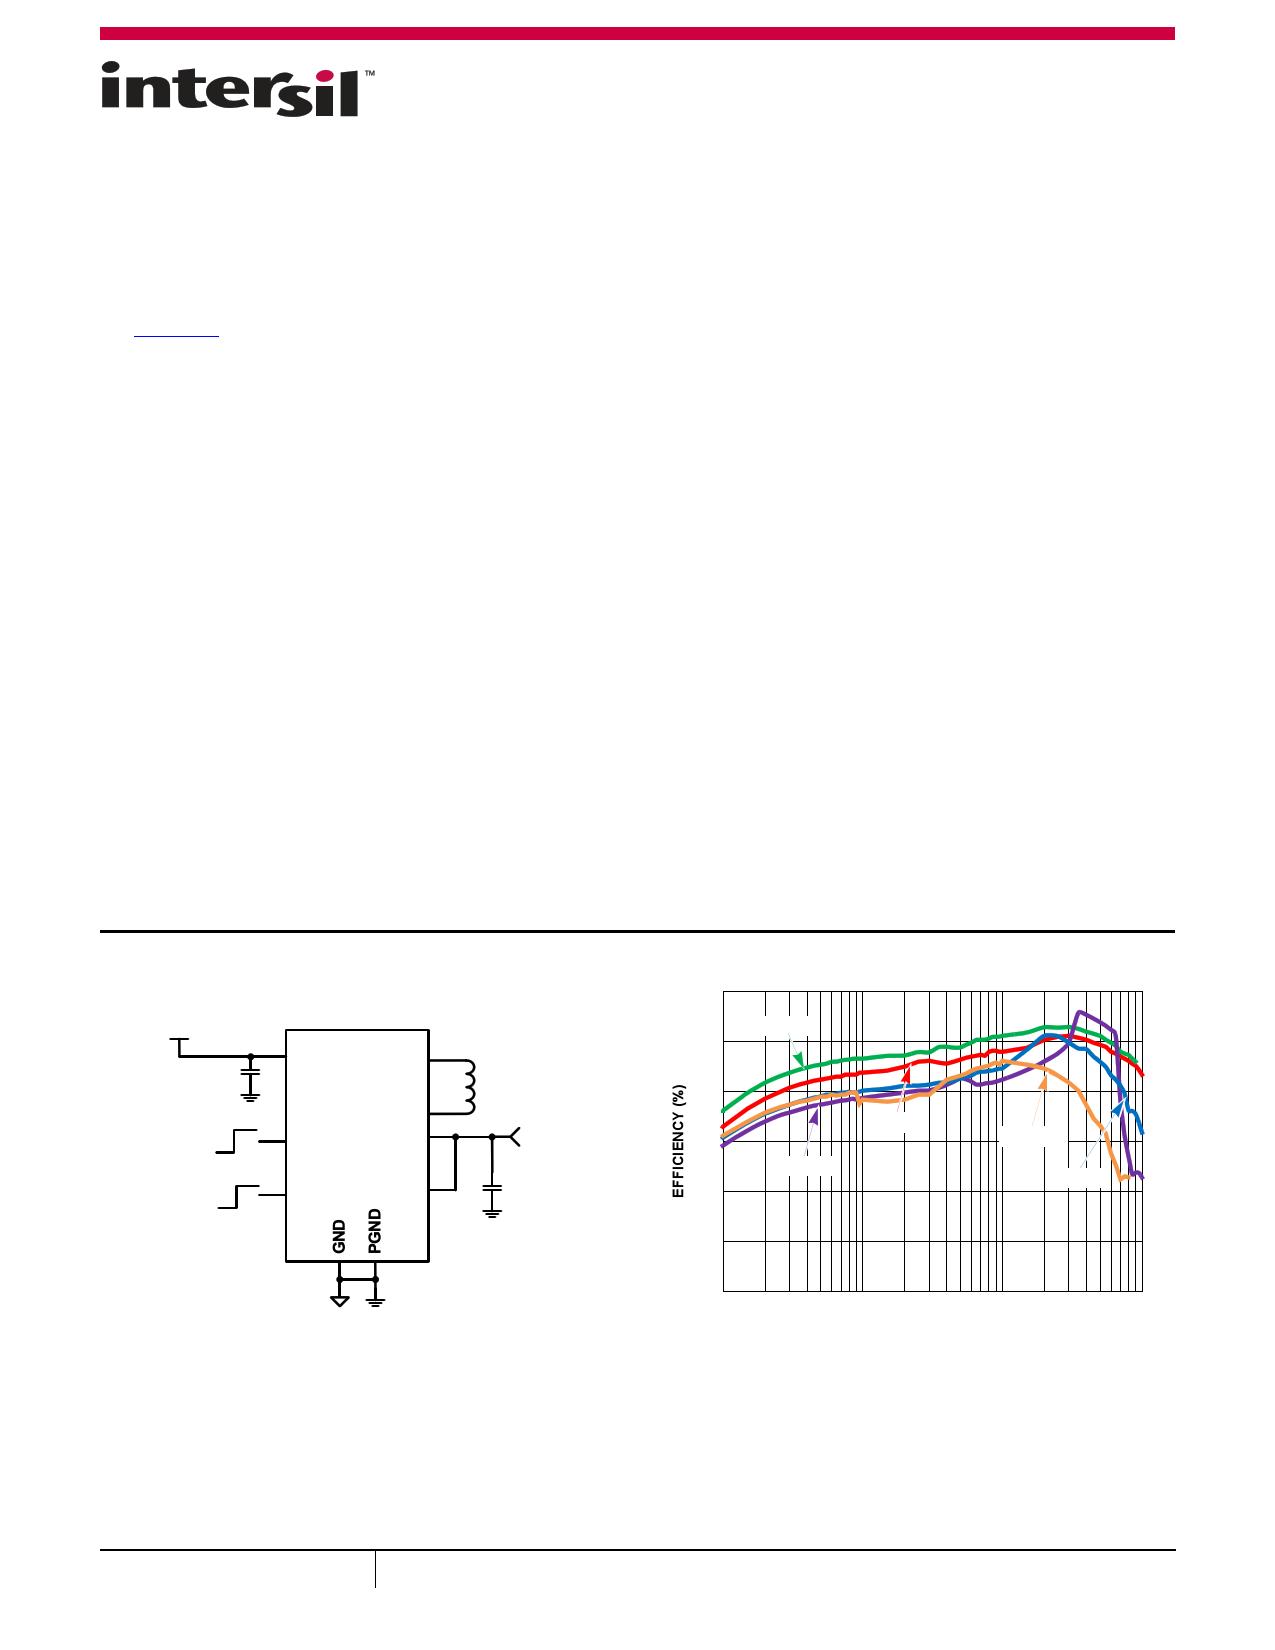 ISL9120IR 데이터시트 및 ISL9120IR PDF